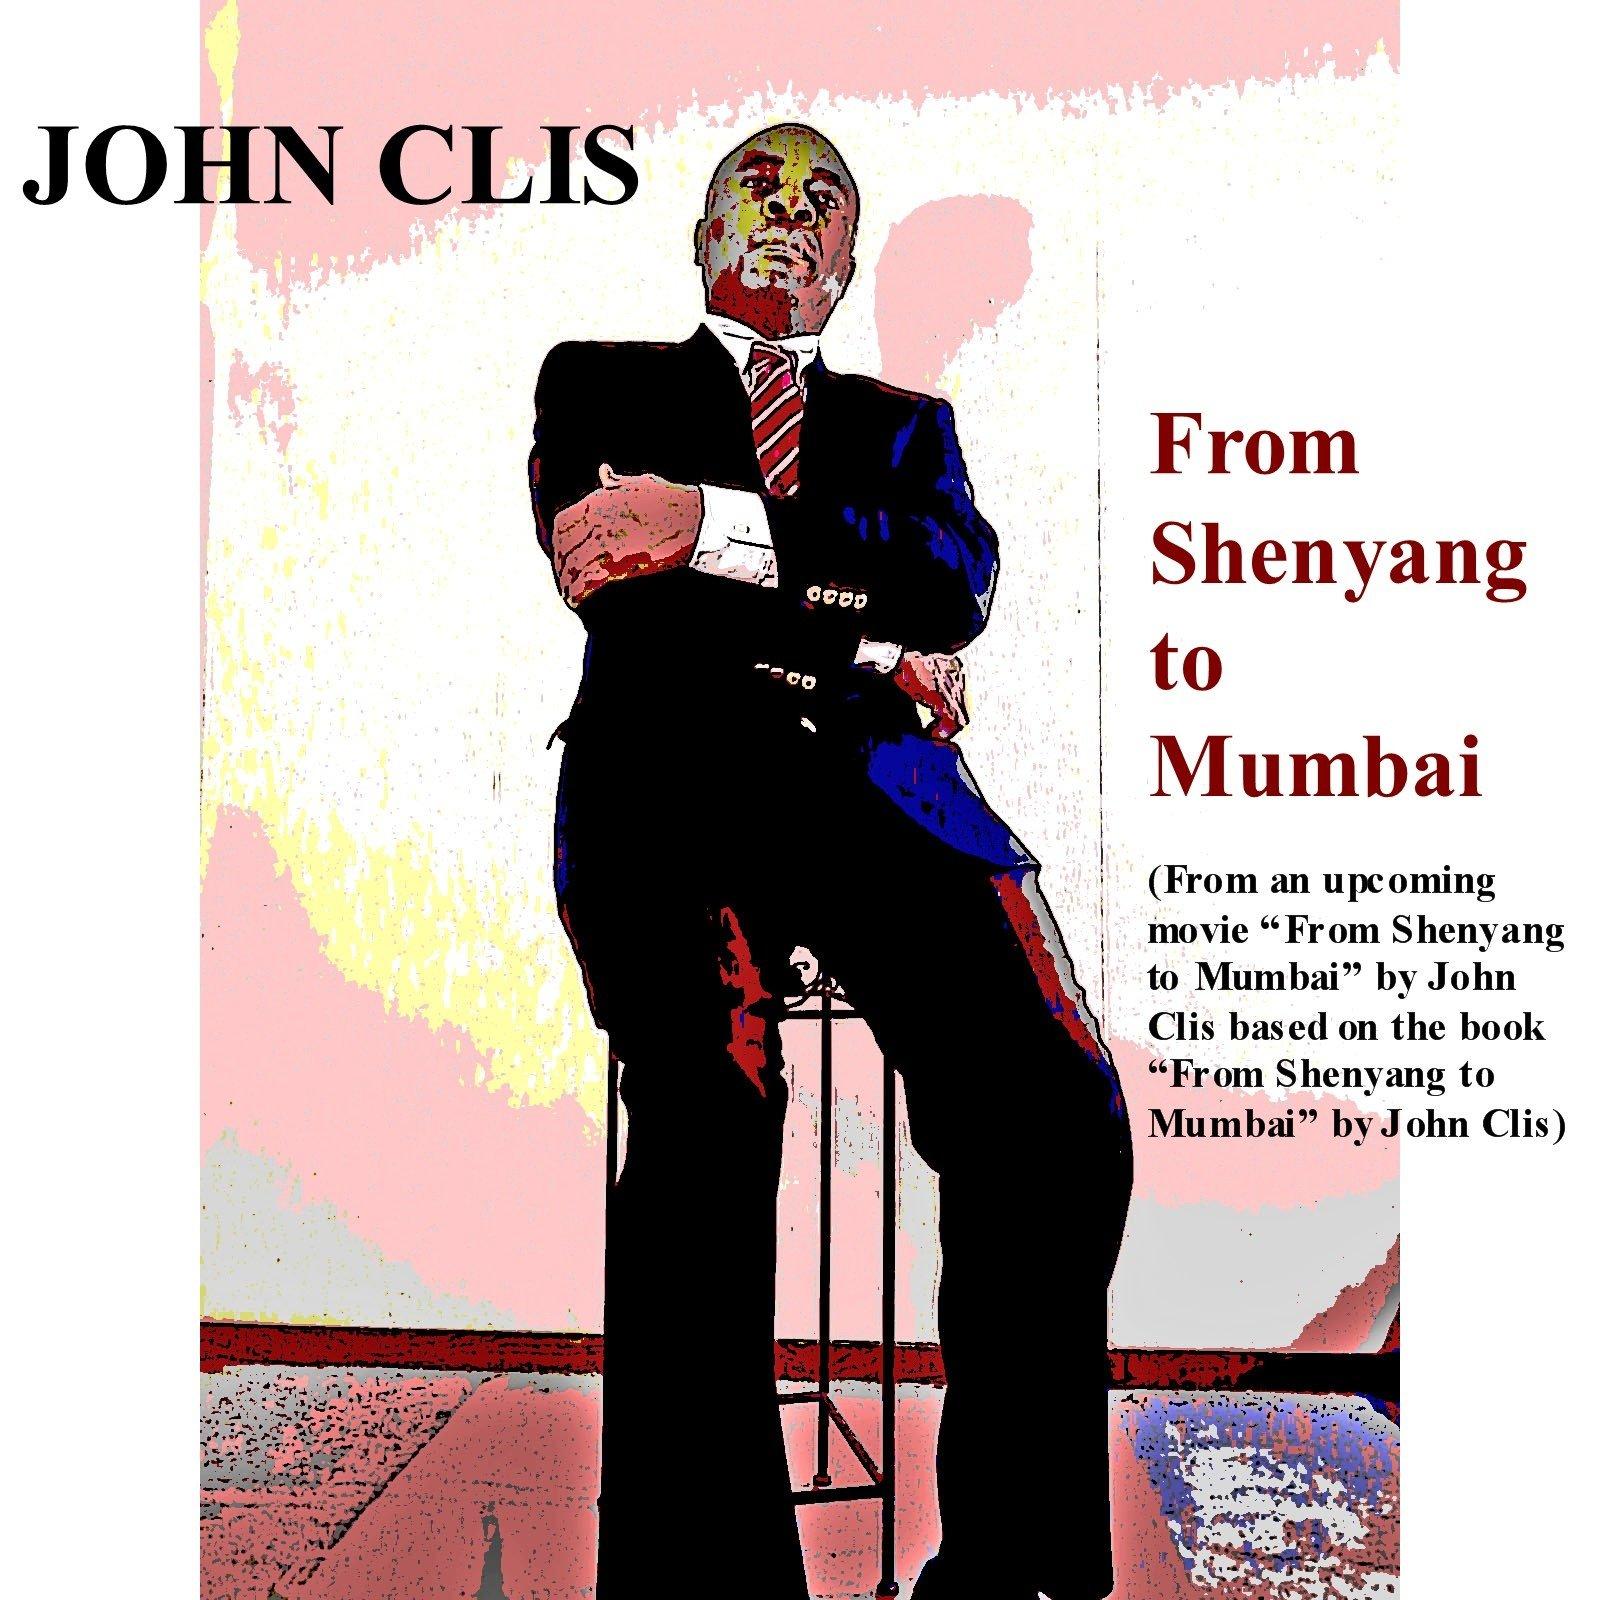 https://0201.nccdn.net/4_2/000/000/038/2d3/John-Clis---From-Shenyang-to-Mumbai---Pic-1a-1600x1600.jpg